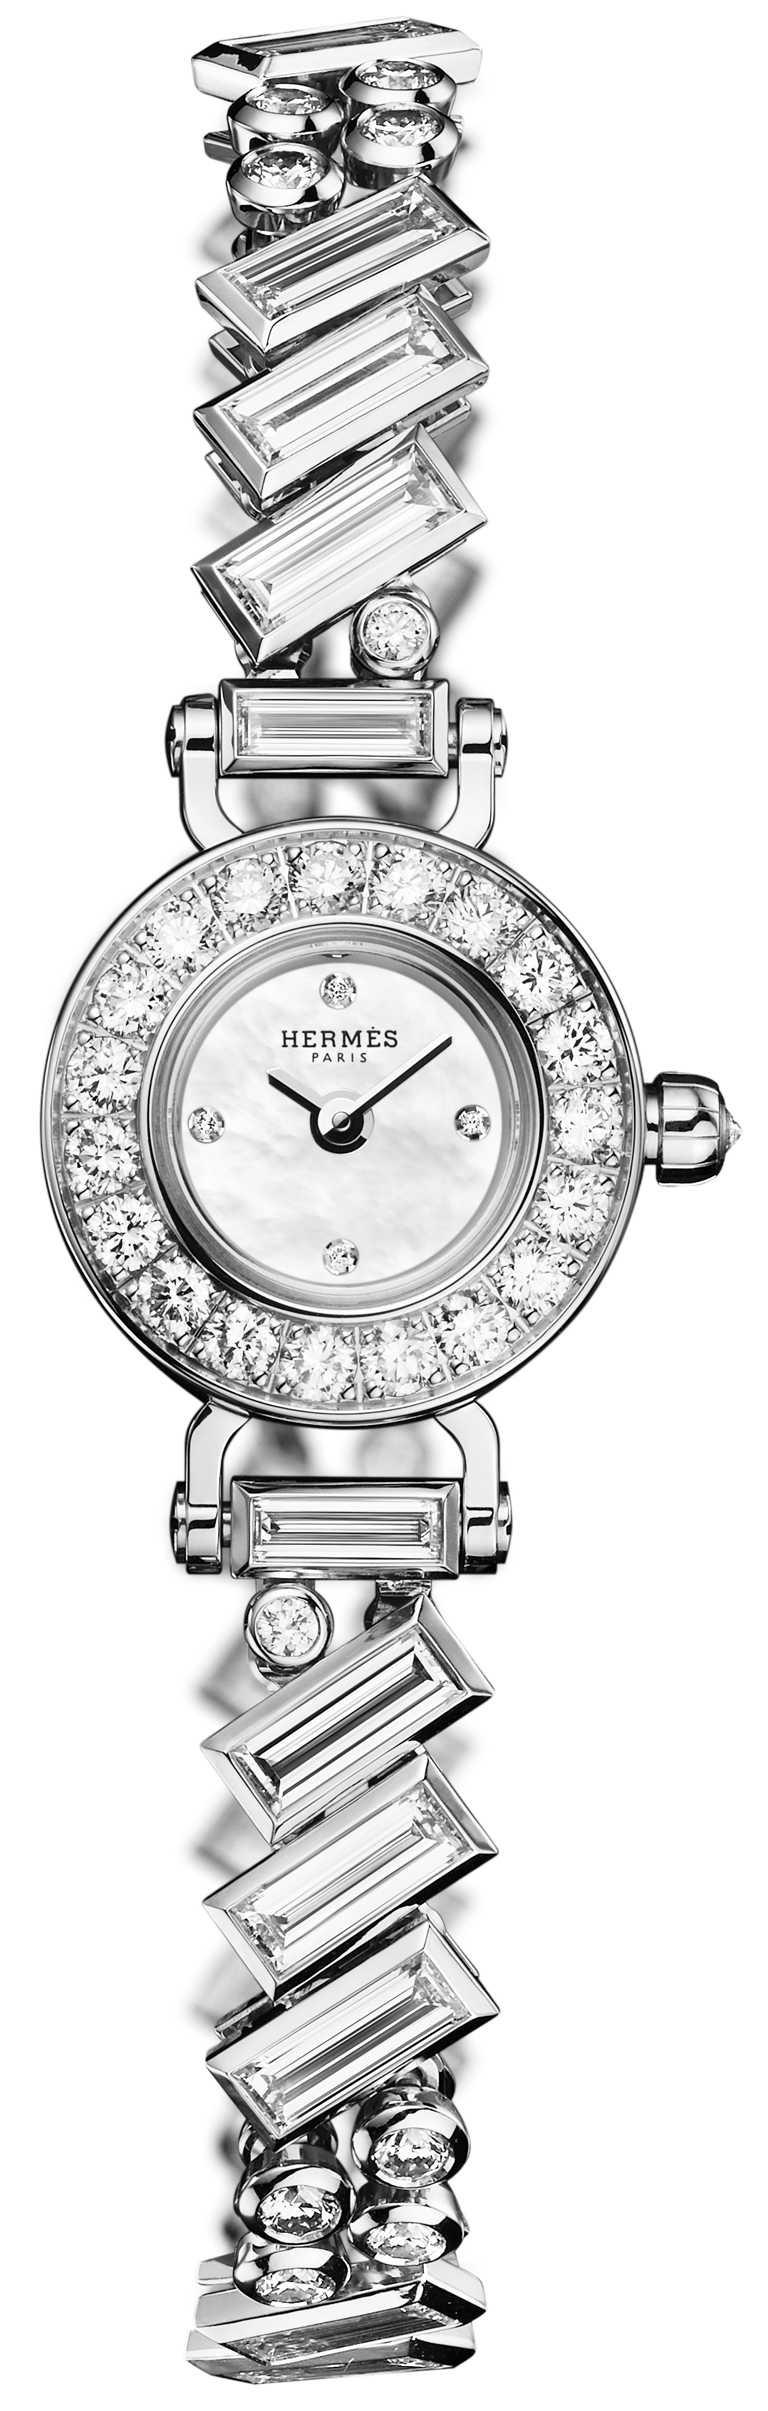 HERMÈS「Faubourg Polka」腕錶,白金錶殼,15.5mm,鑽石107顆╱價格未定。(圖╱HERMÈS提供)